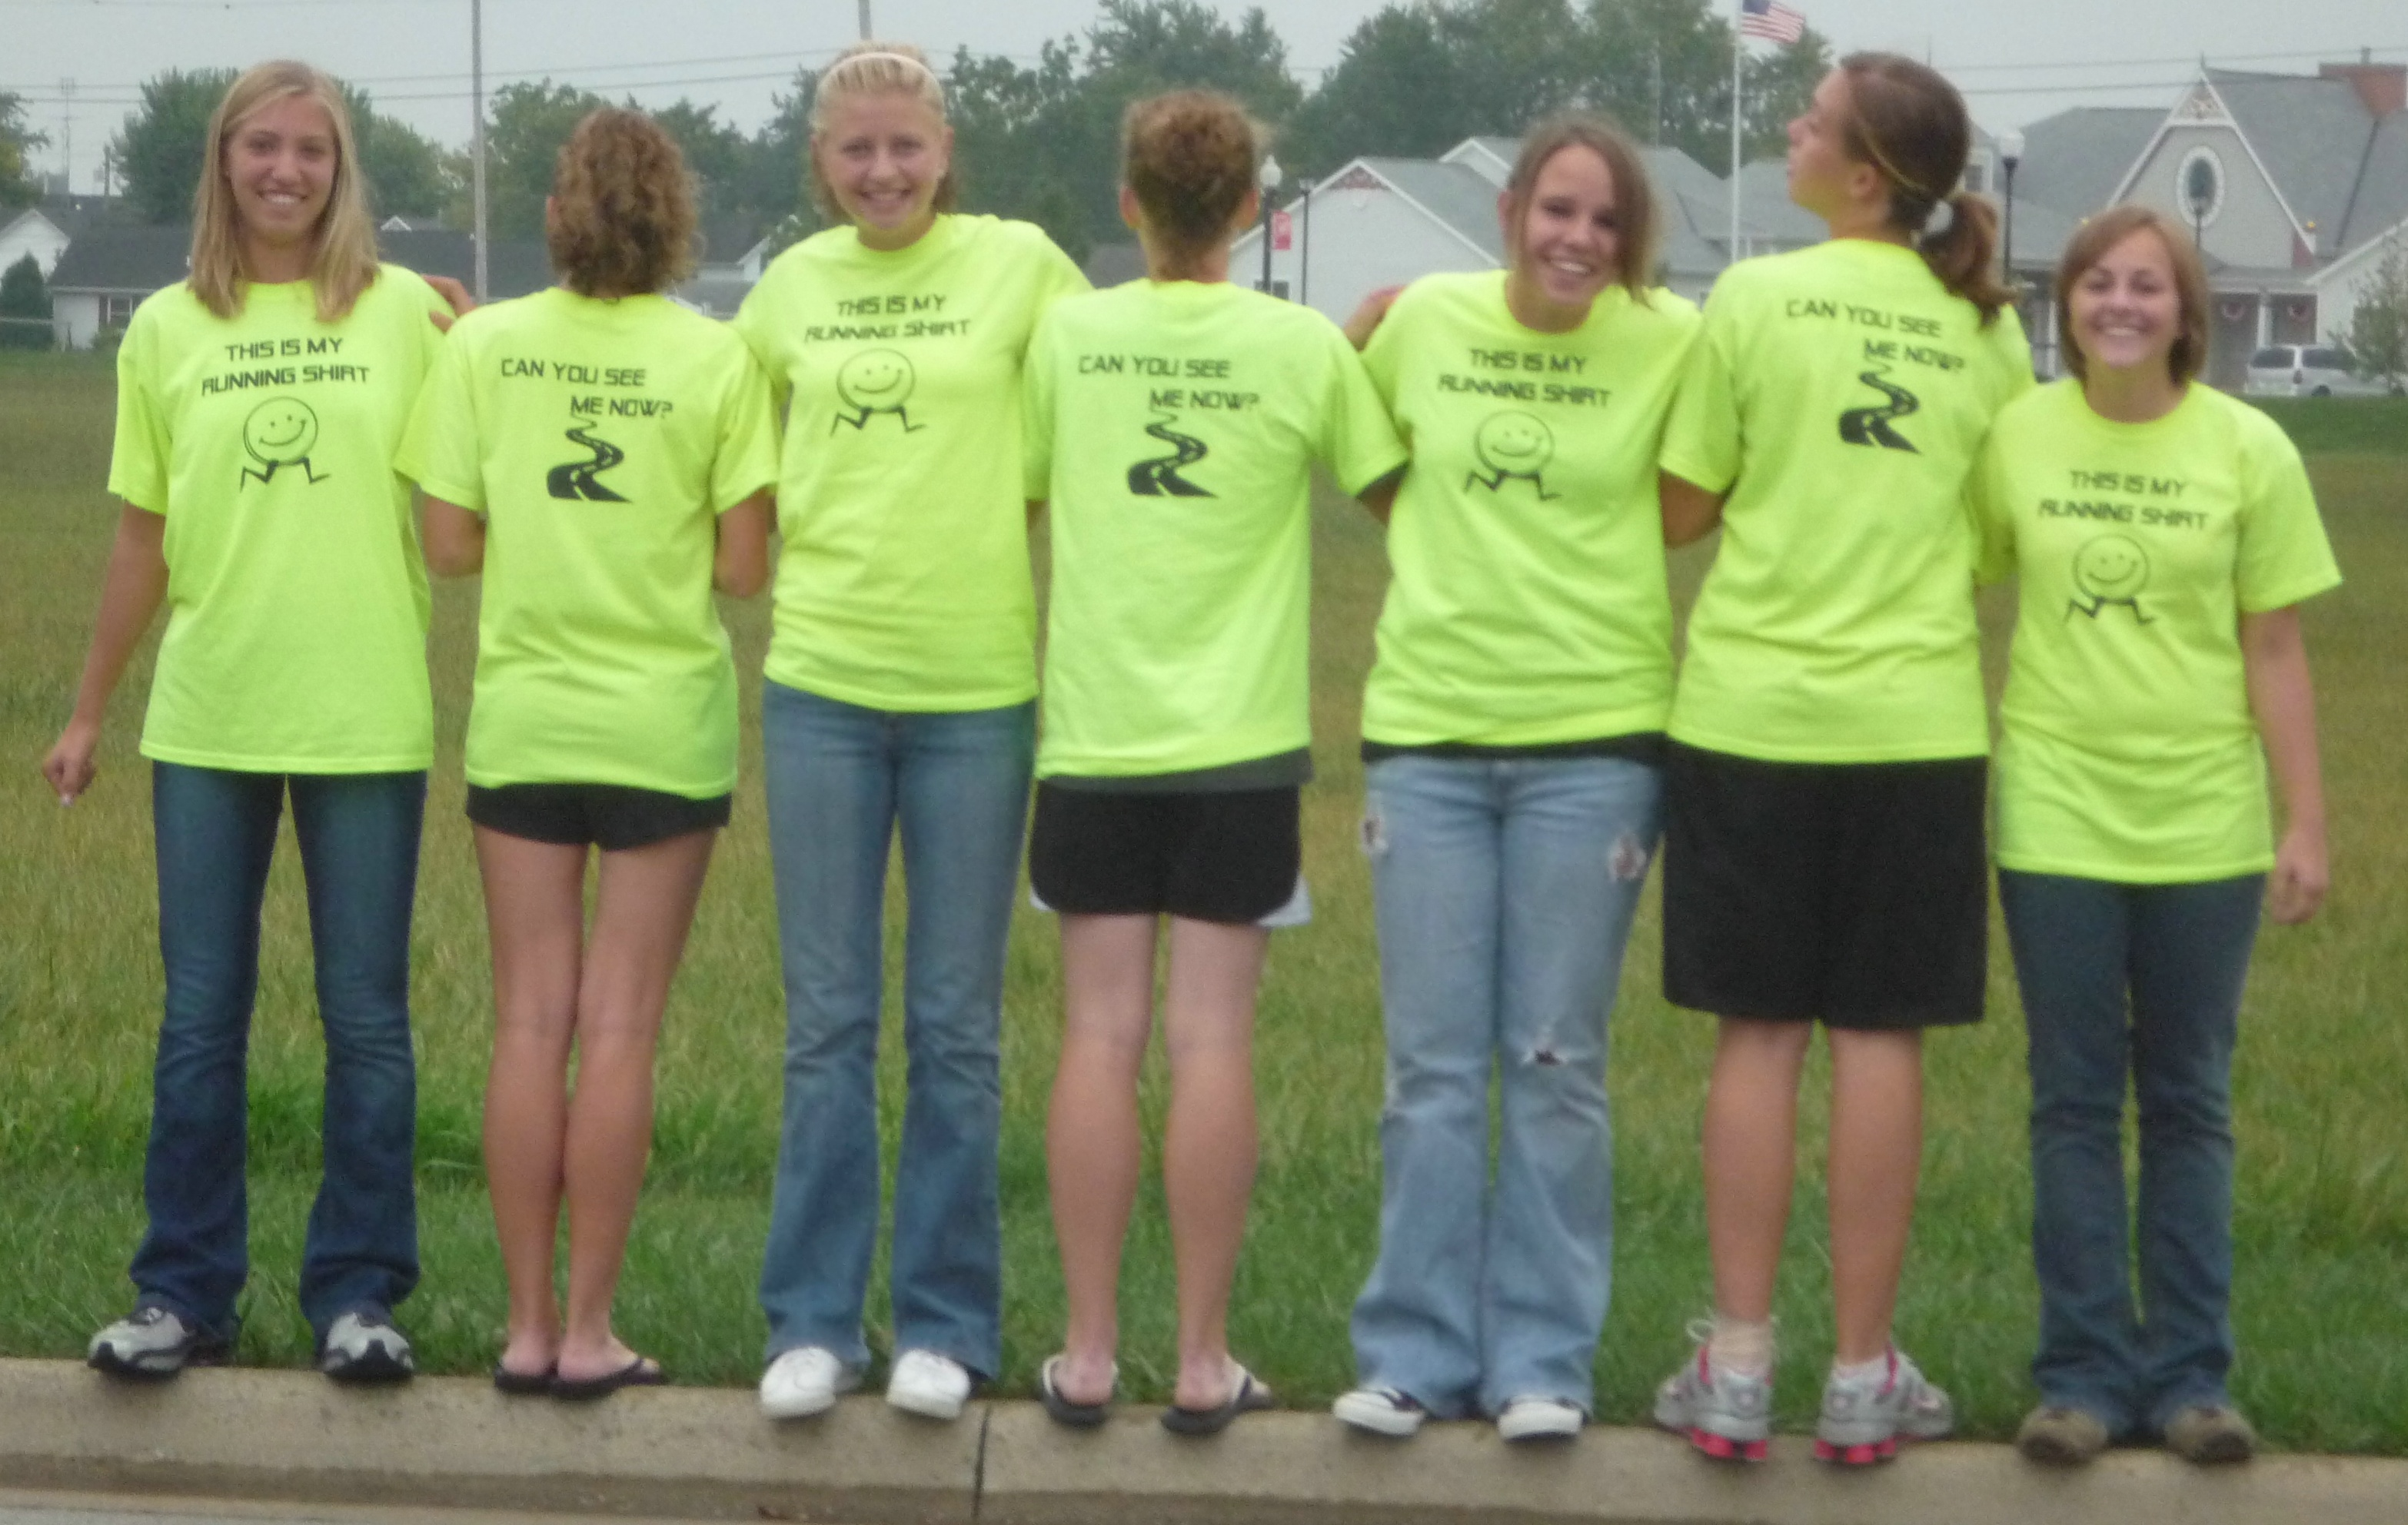 Design your own t-shirt female - Girls Cross Country Team T Shirt Photo